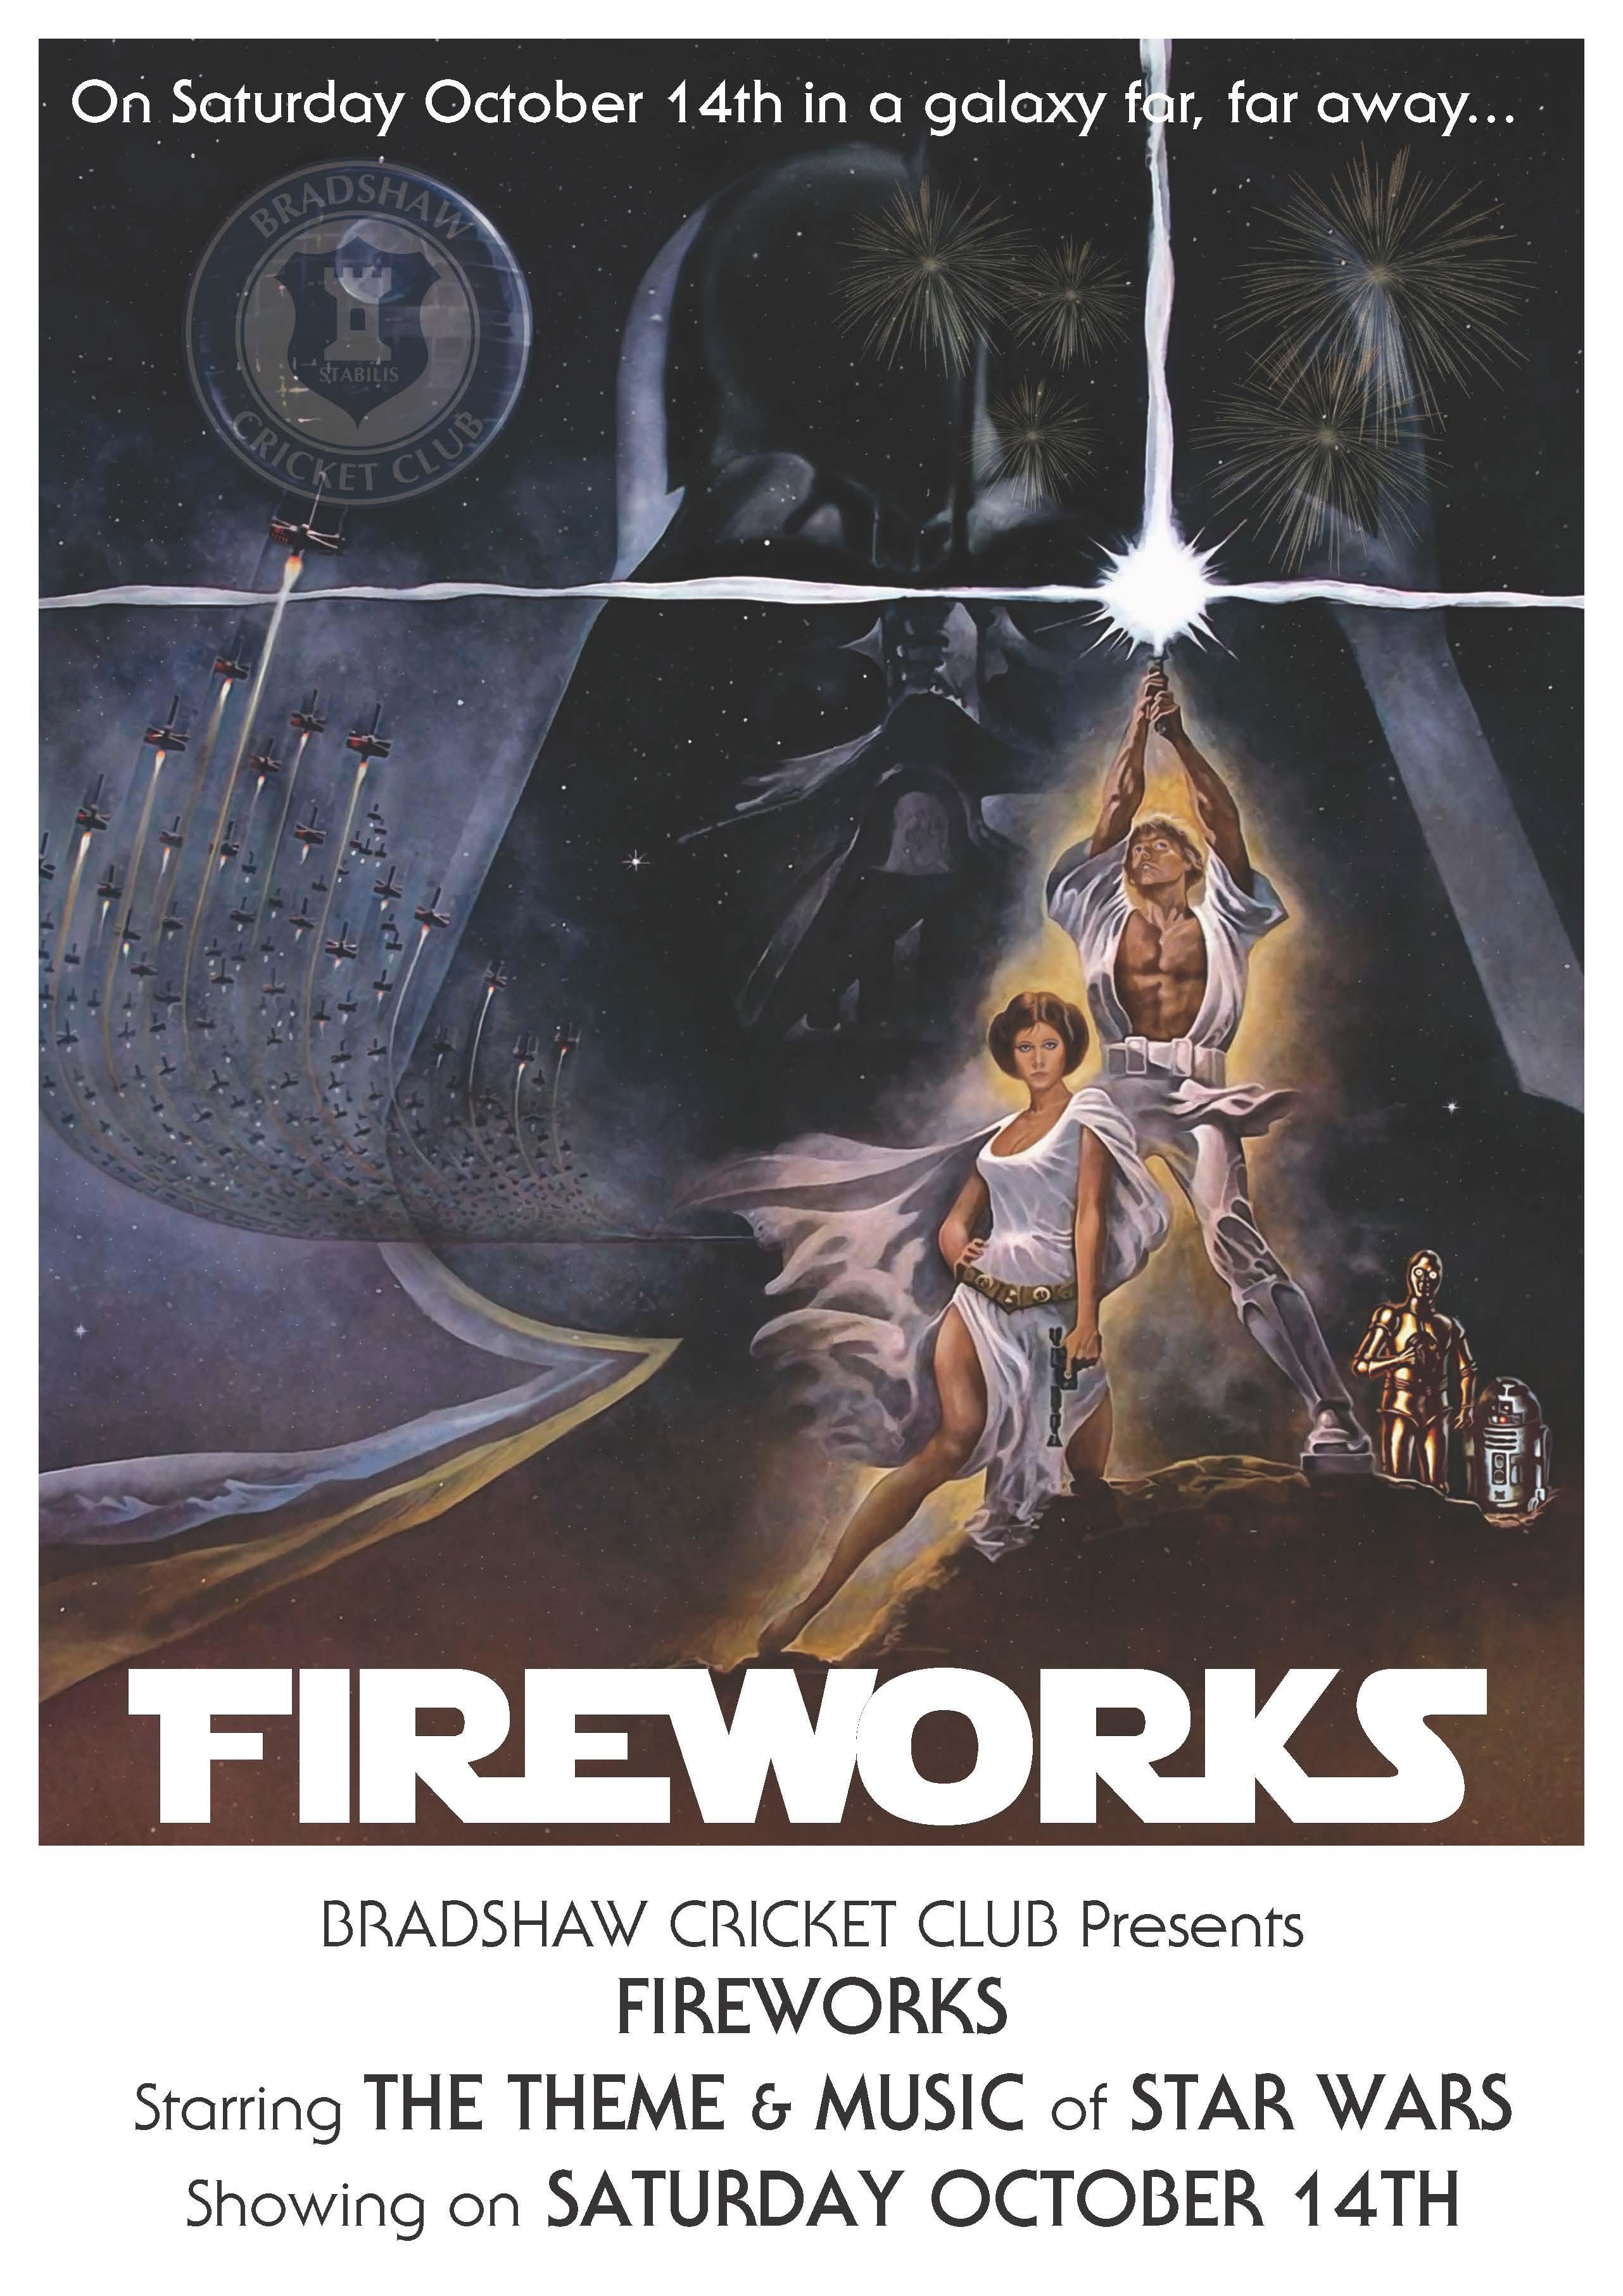 Fireworks Star Wars